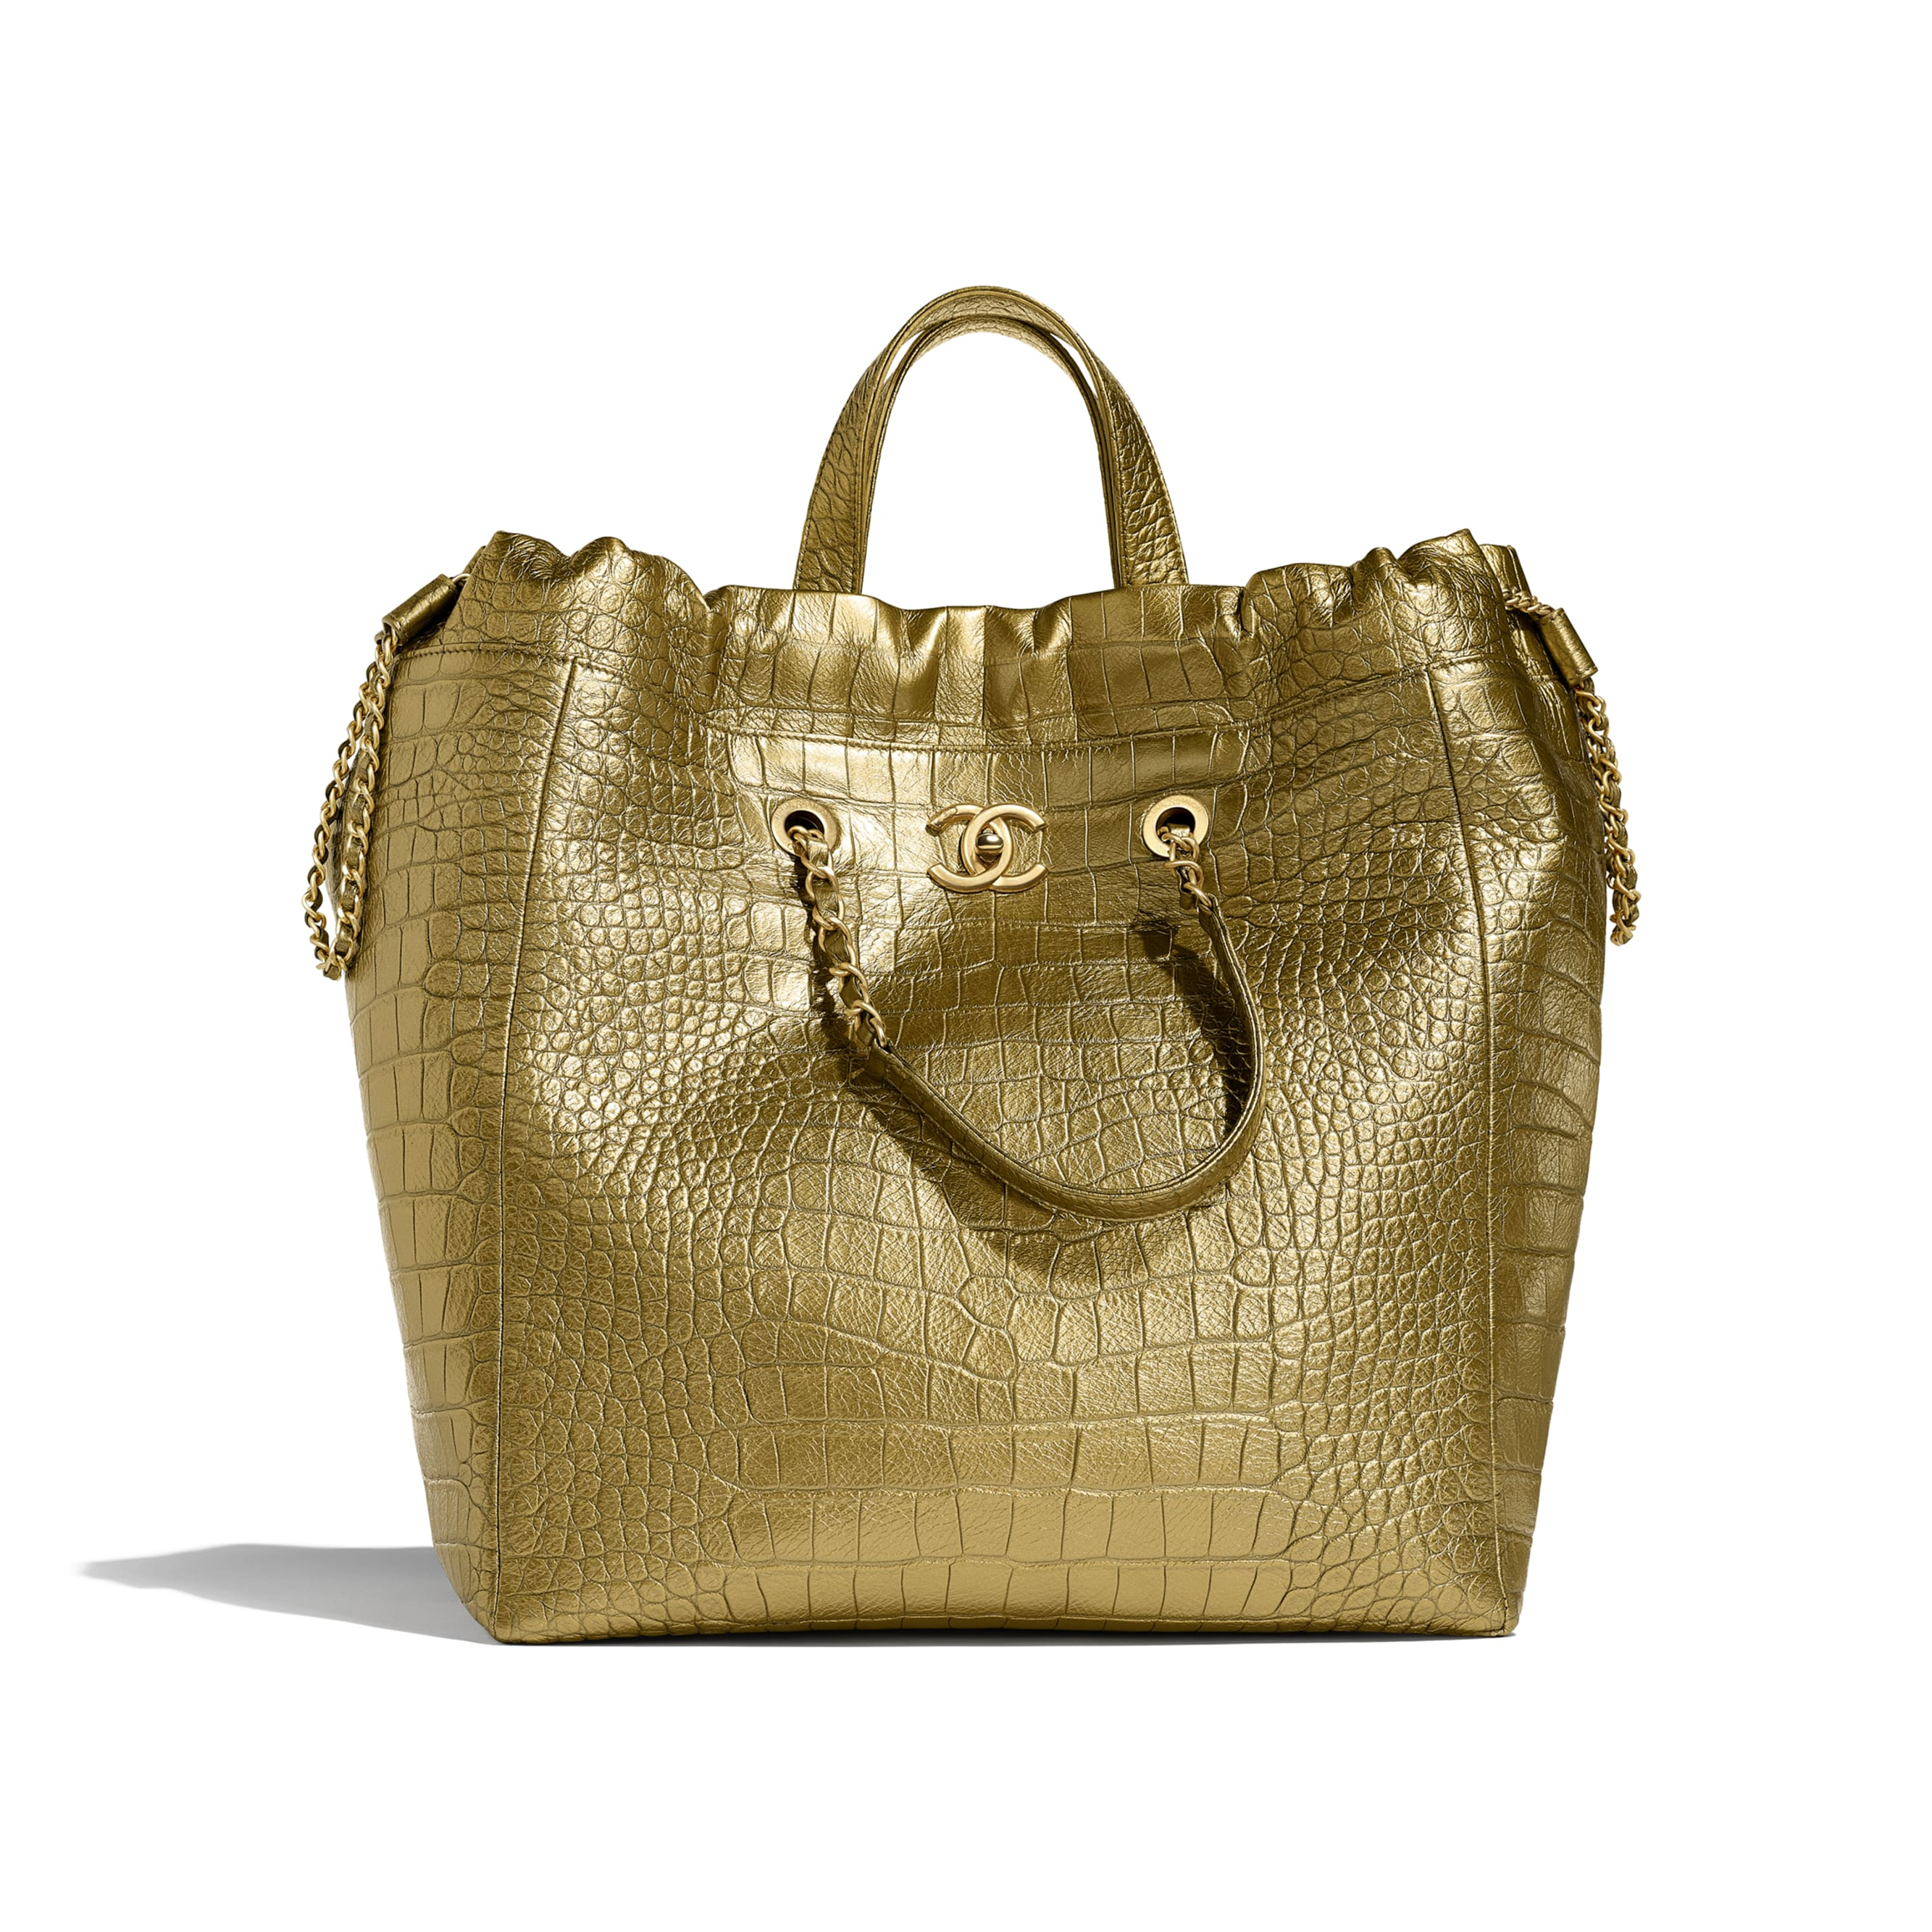 Large Shopping Bag - Gold - Metallic Crocodile Embossed Calfskin & Gold Metal - Default view - see standard sized version